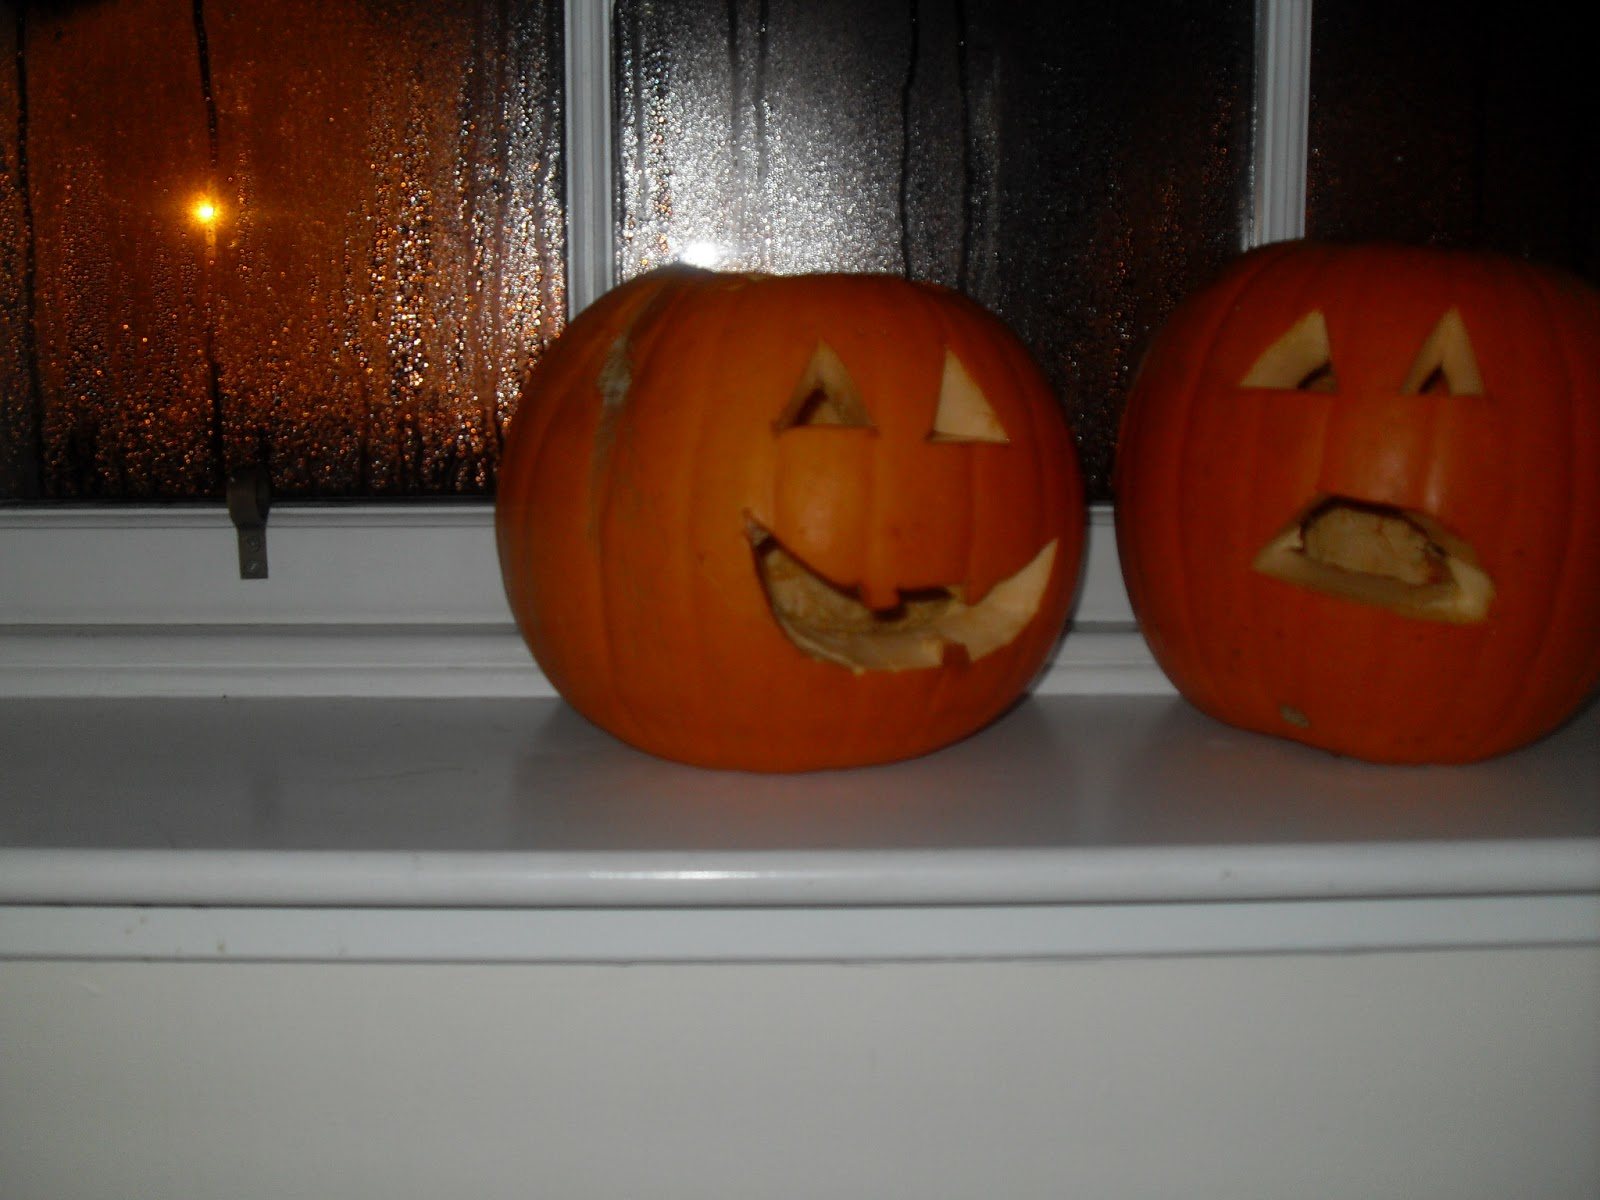 Recipe: Oven Roasted Pumpkin Seeds